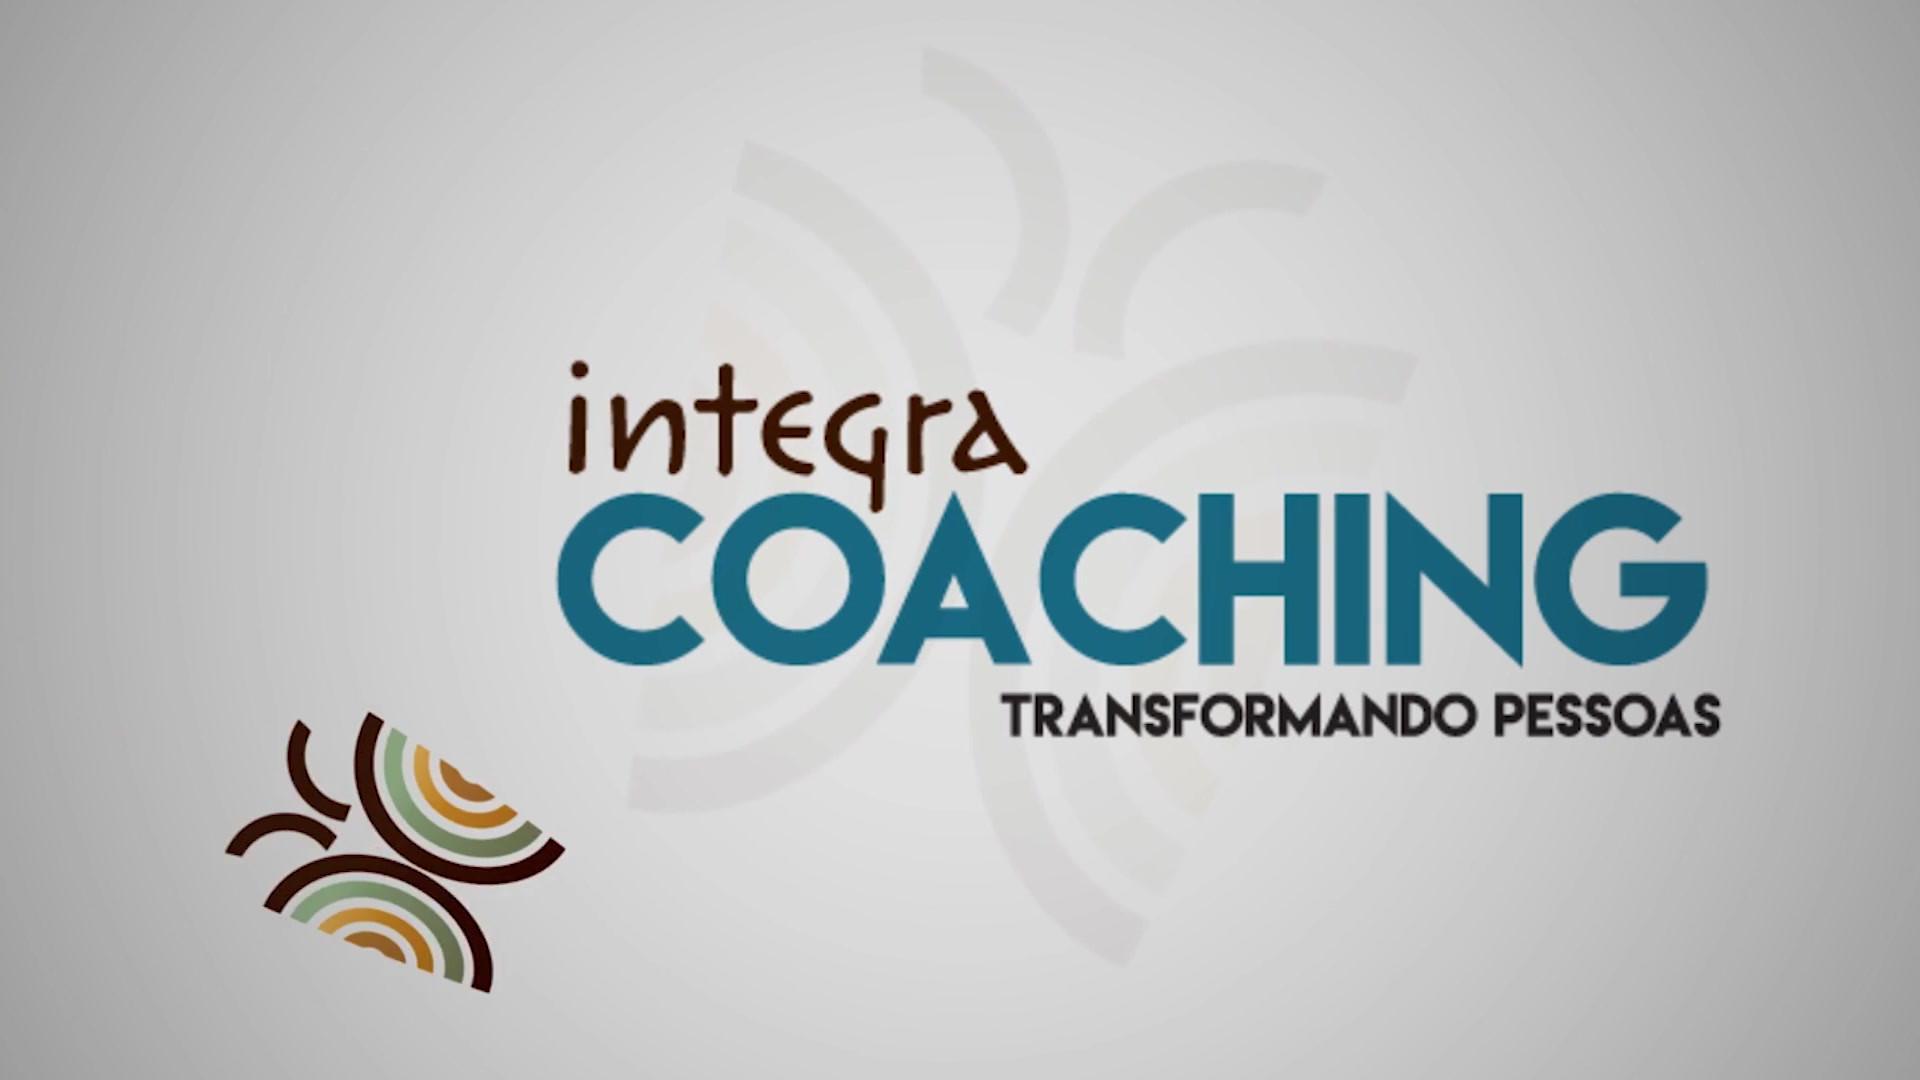 Marcelo_Integra_Coaching.mp4